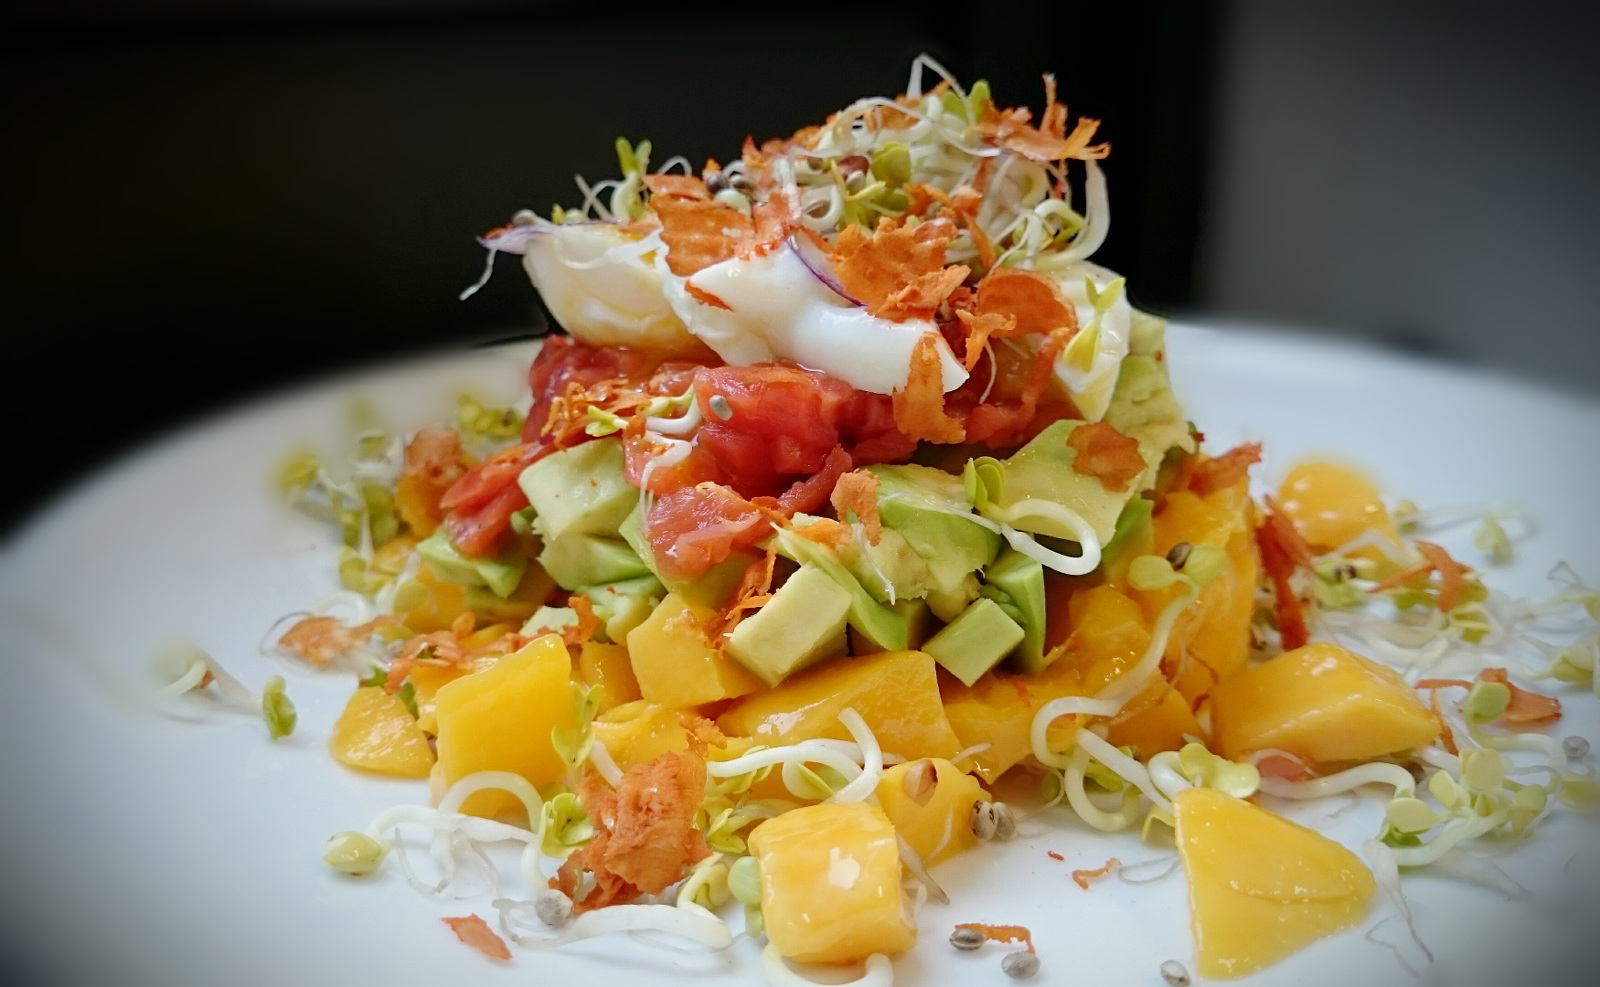 Mango-Avocado-Lachs-Ei-Türmchen_1